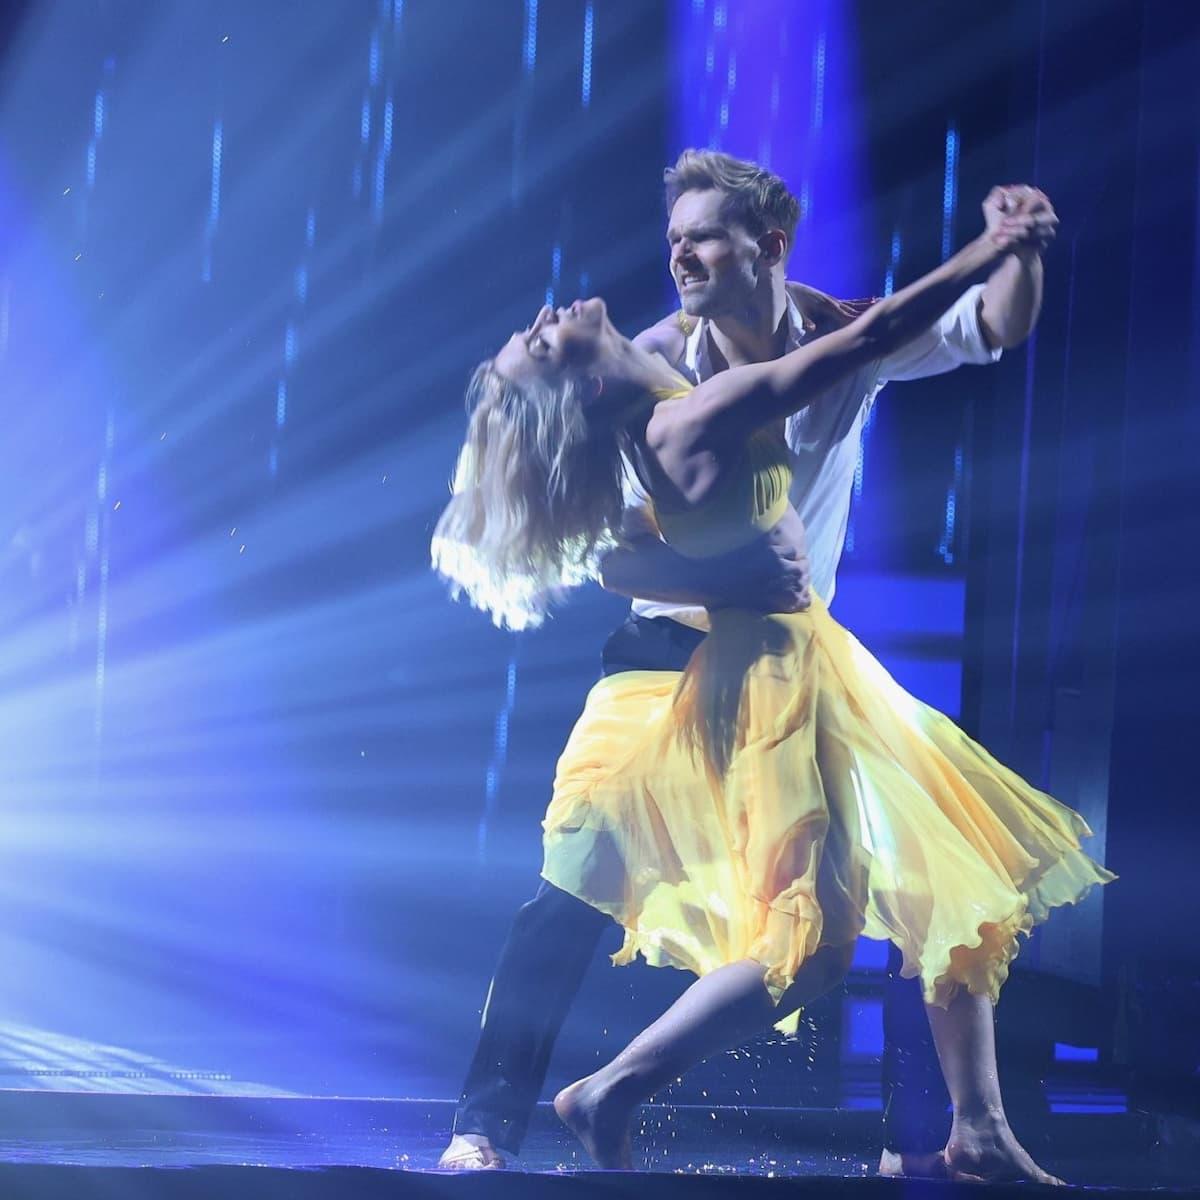 Kathrin Menzinger - Vadim Garbuzov Platz 2 Profi-Challenge Let's dance am 4.6.2021